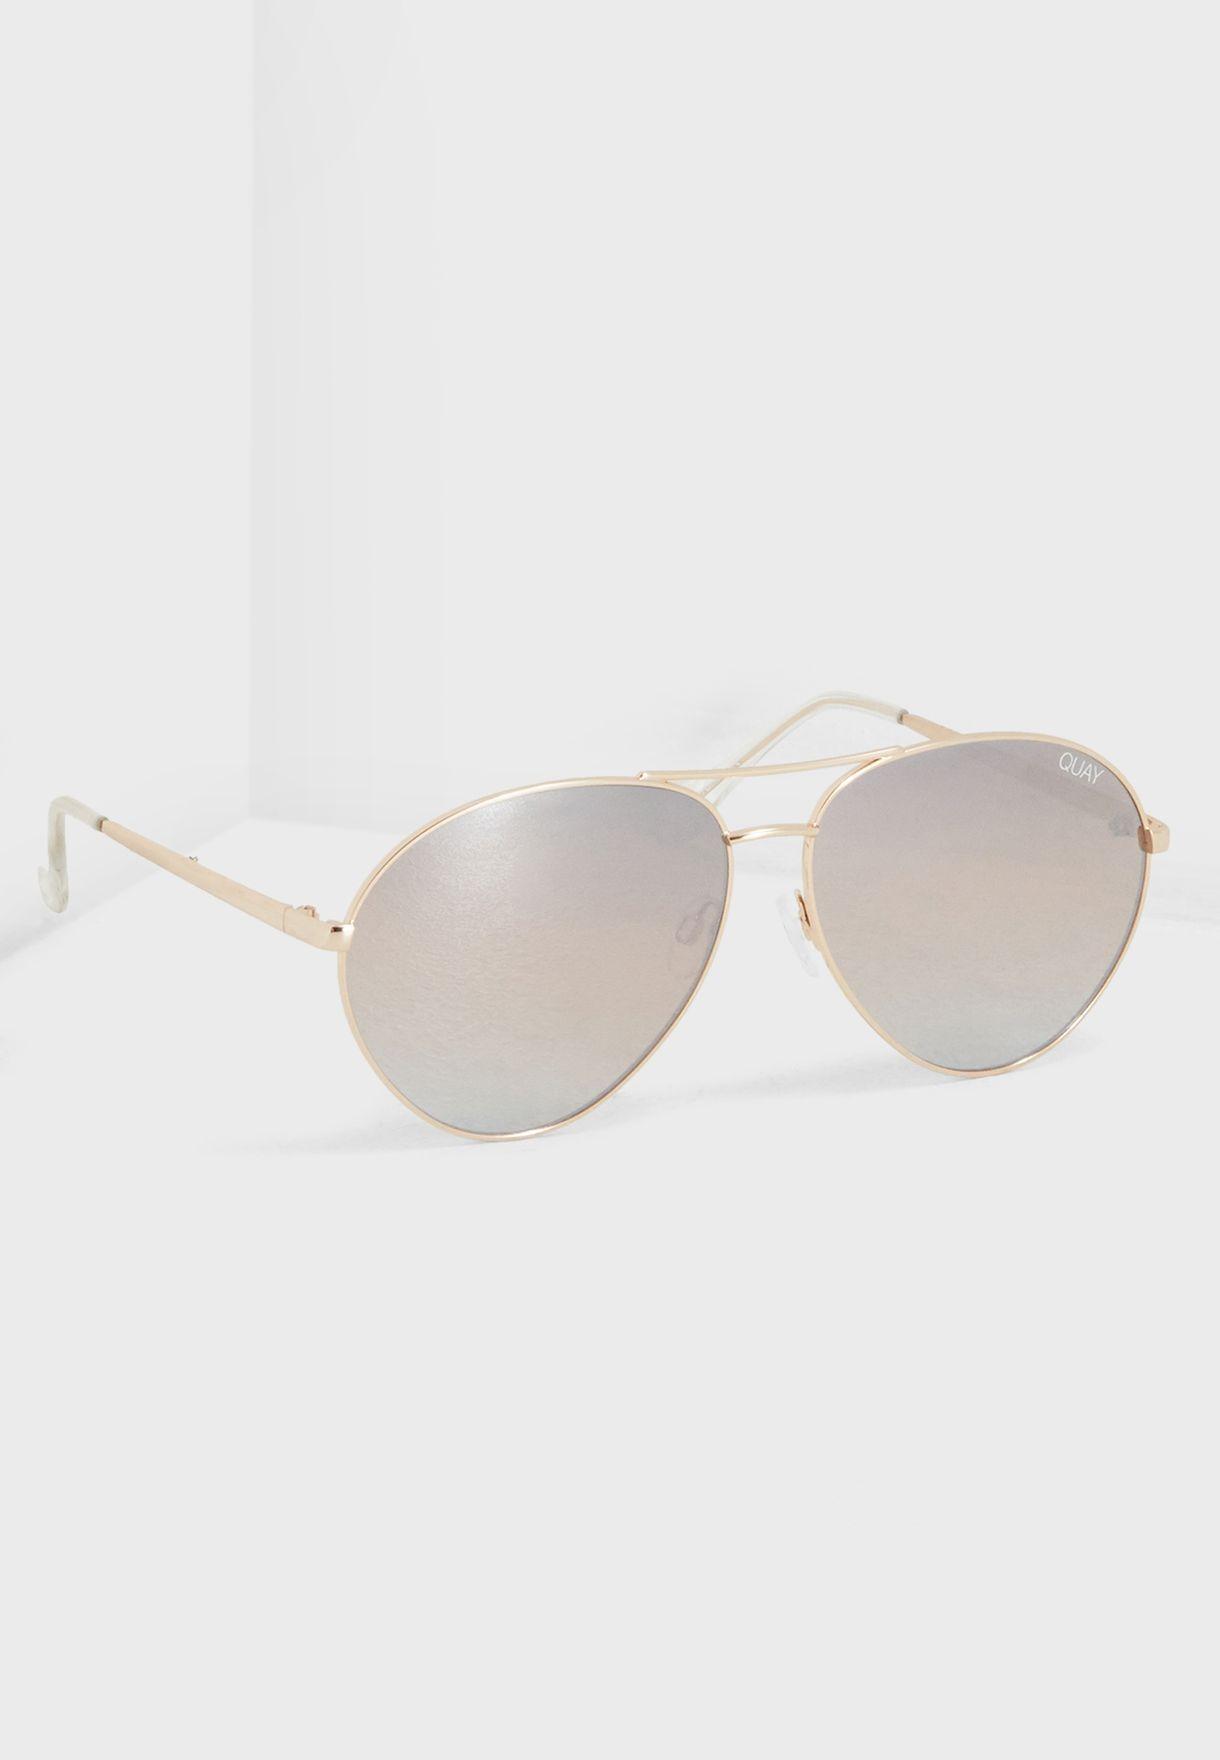 557065c0dd Shop Quay Australia gold Just Sayin Sunglasses QW-000406-GLD BRN for ...